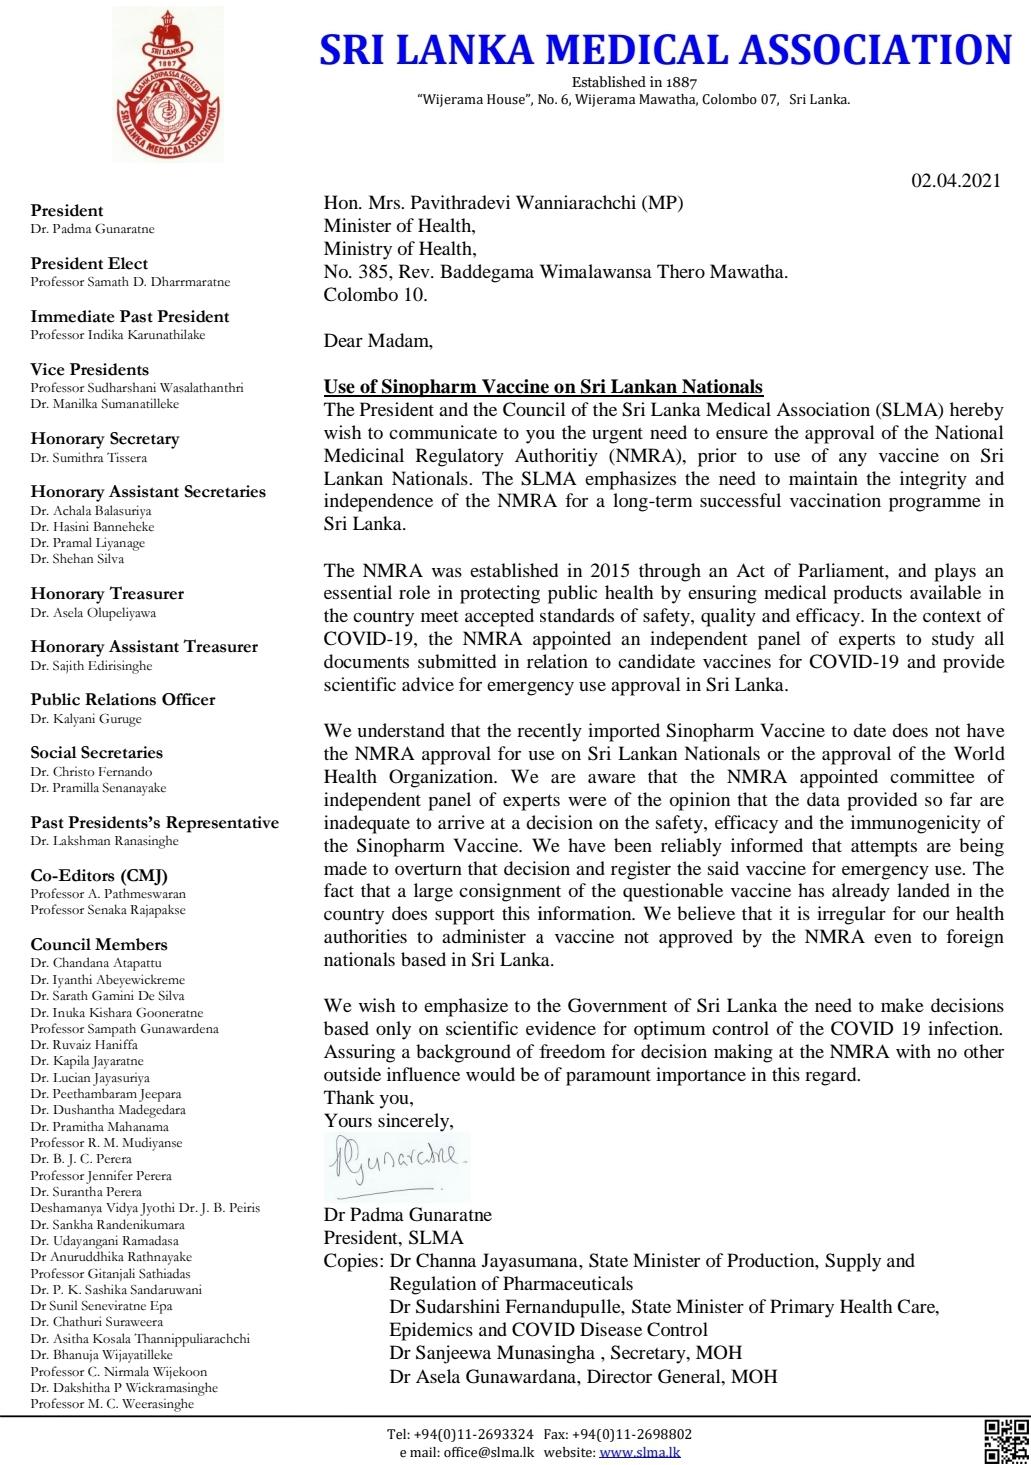 Sri Lanka Medical Association raises concerns over Sinopharm vaccine